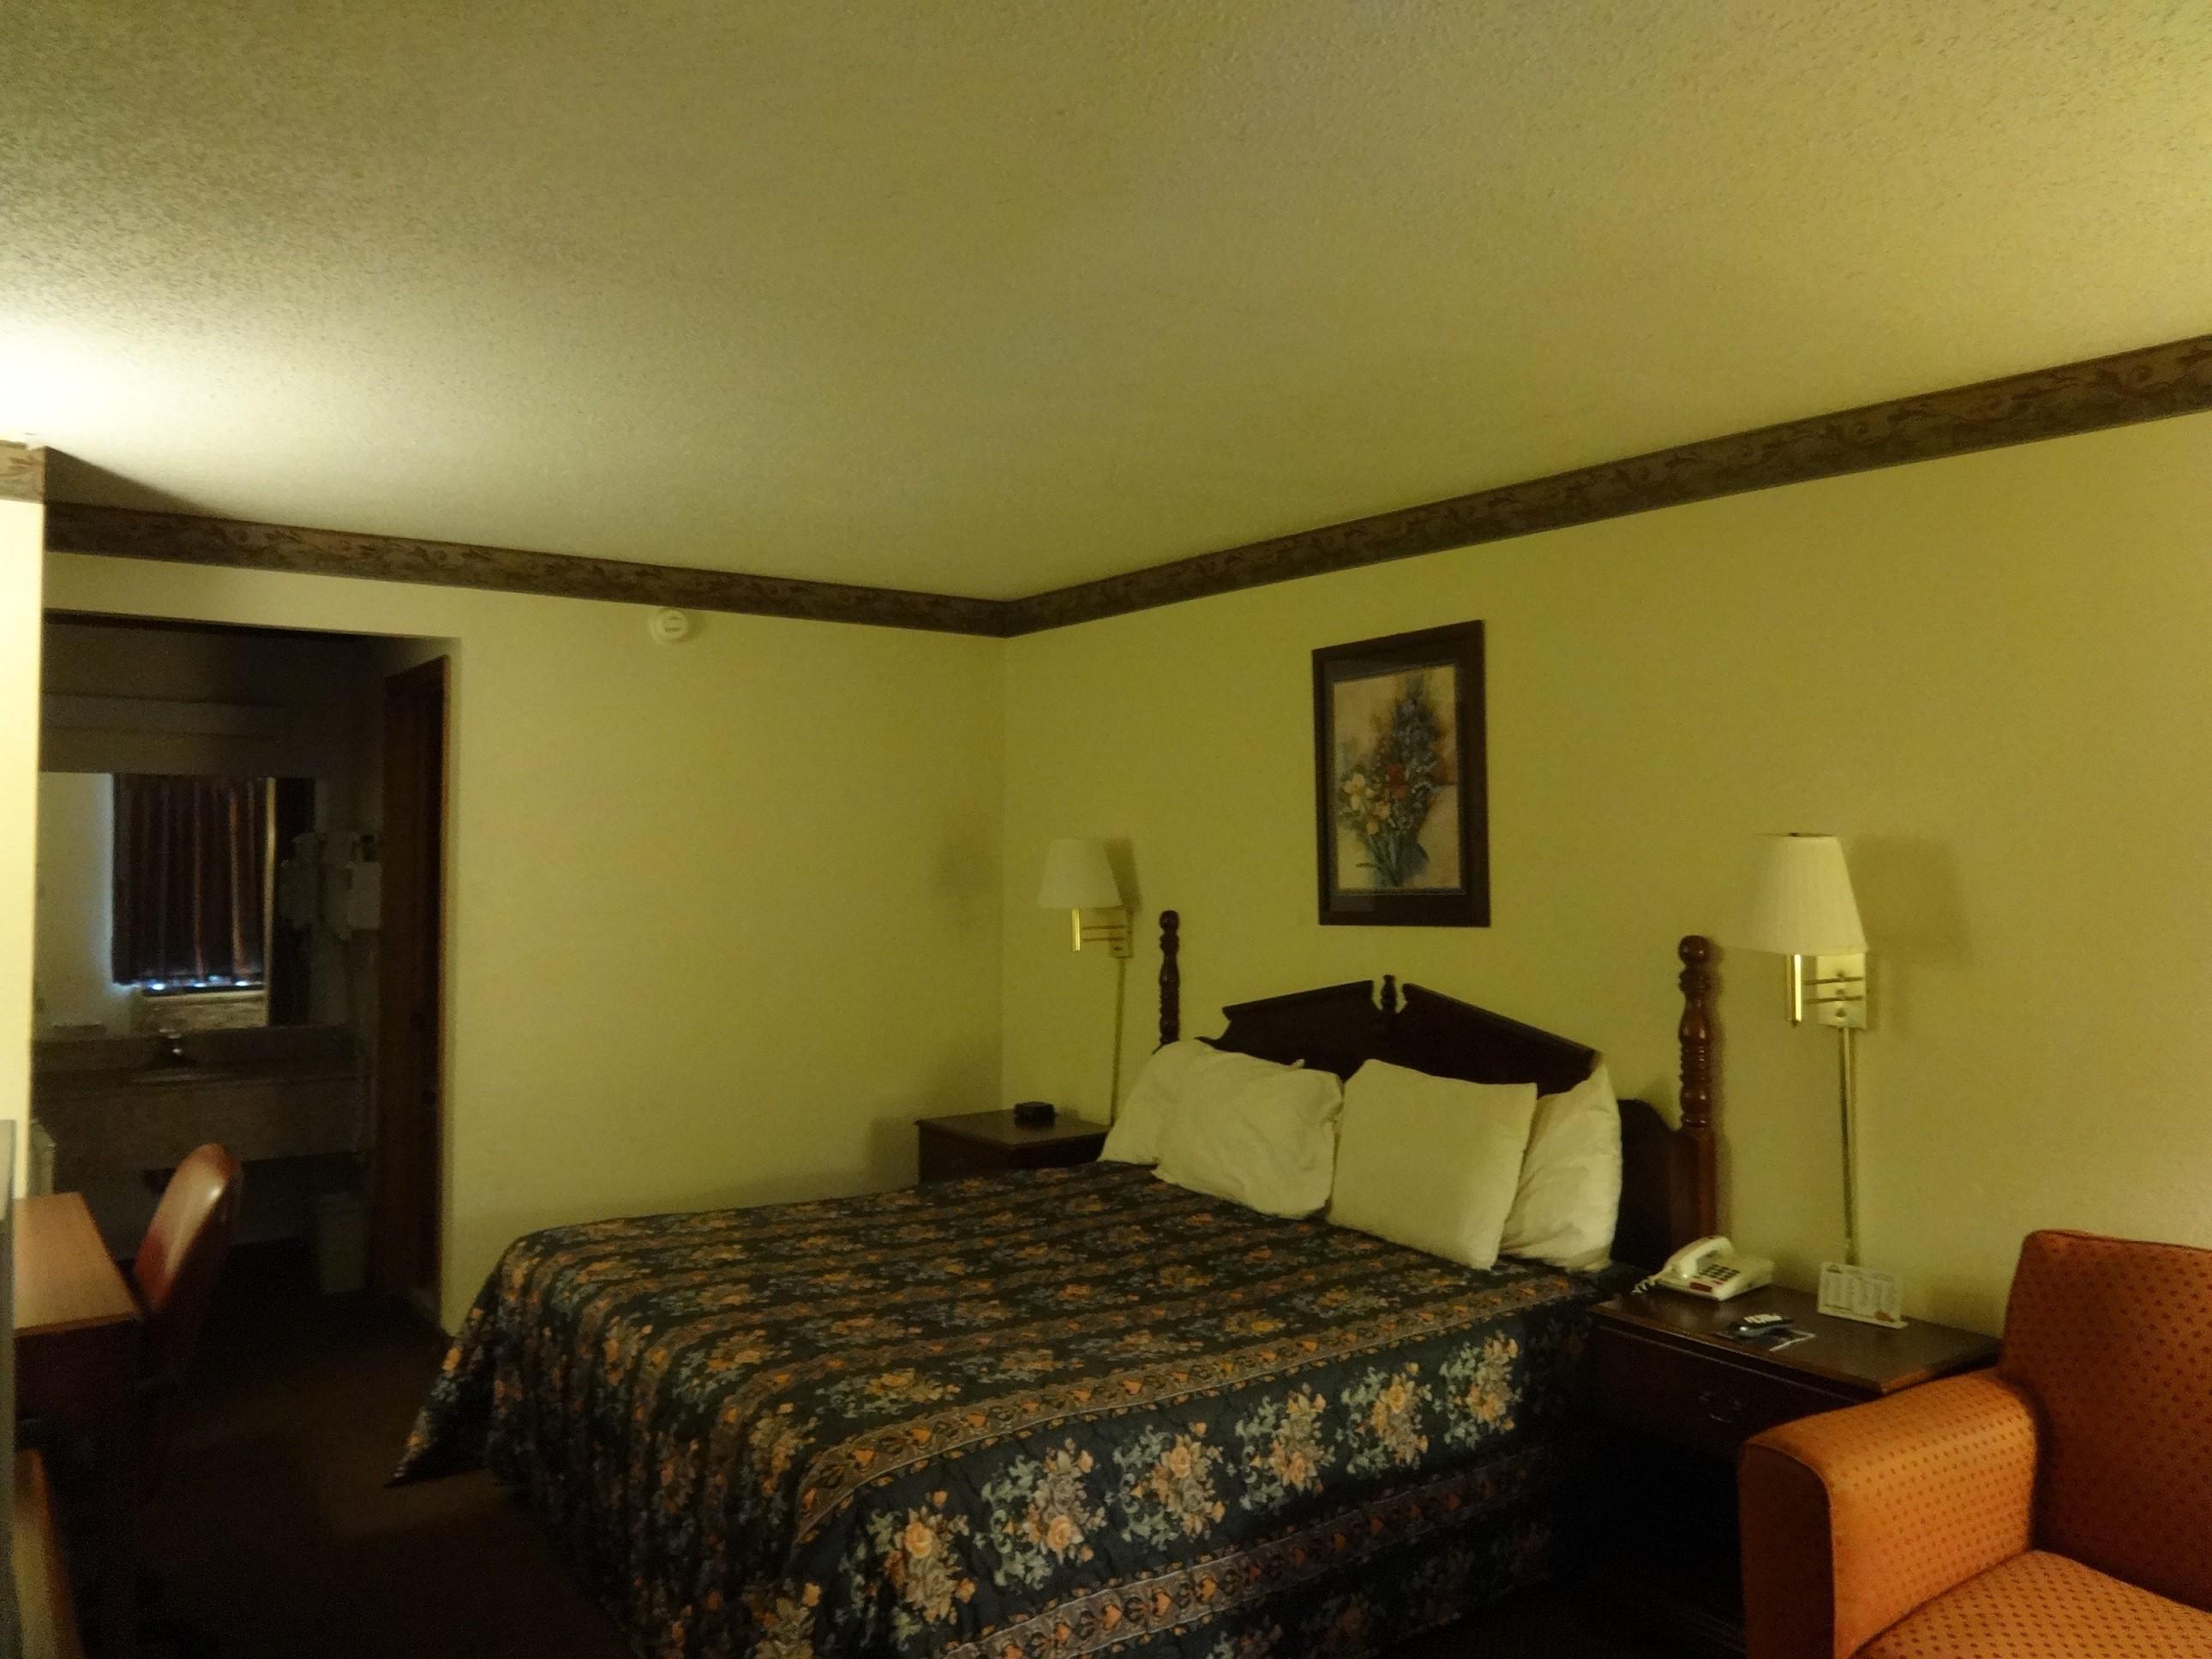 Days Inn Hotel interior